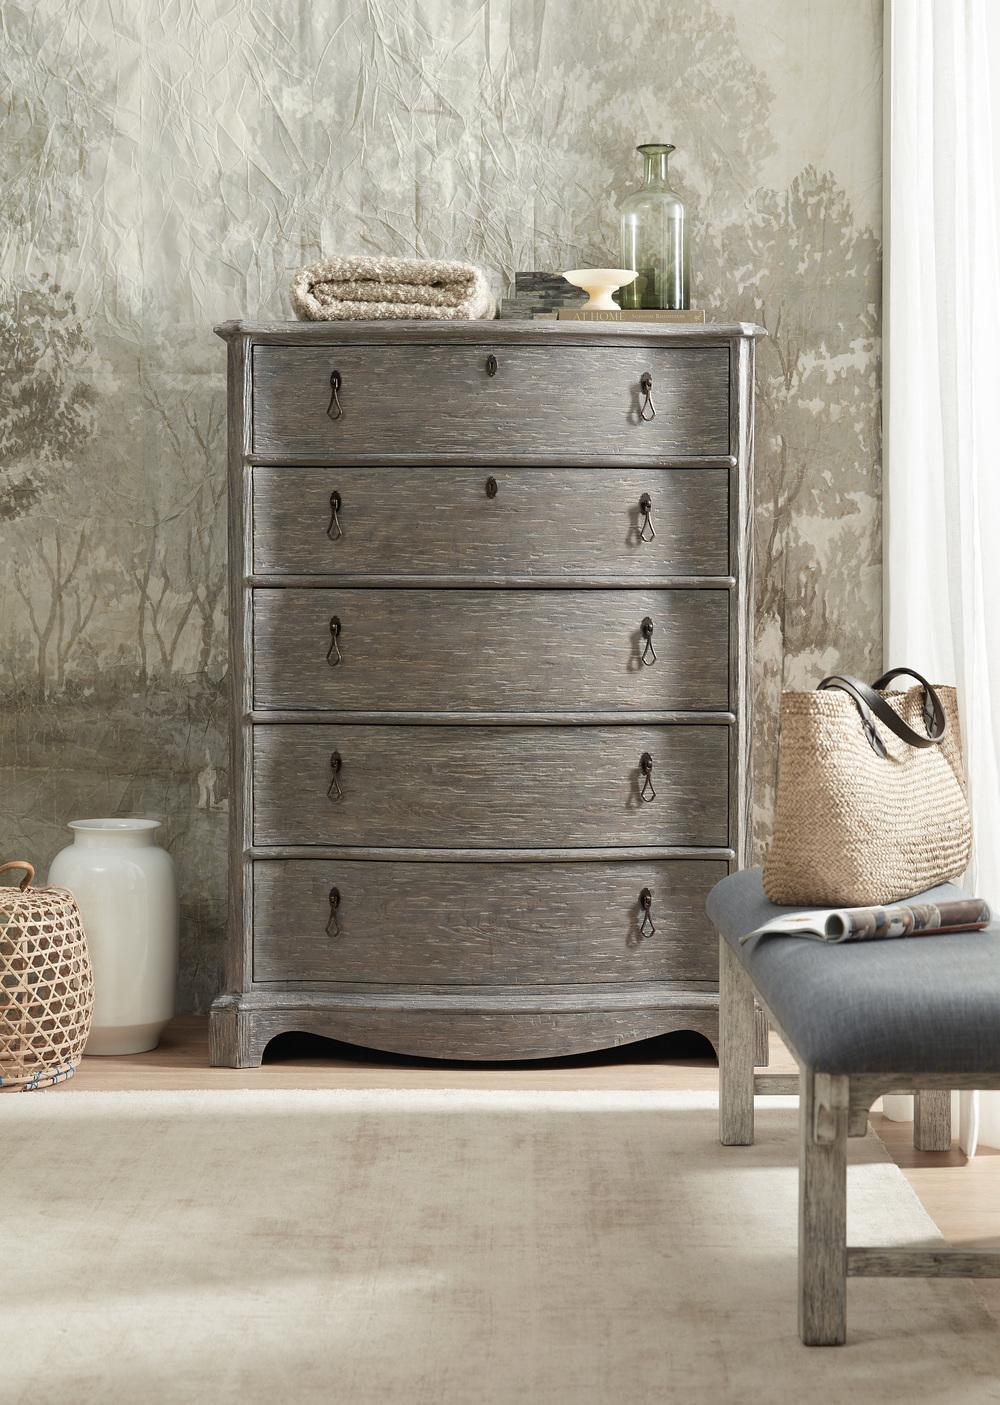 Hooker Furniture - Five Drawer Chest